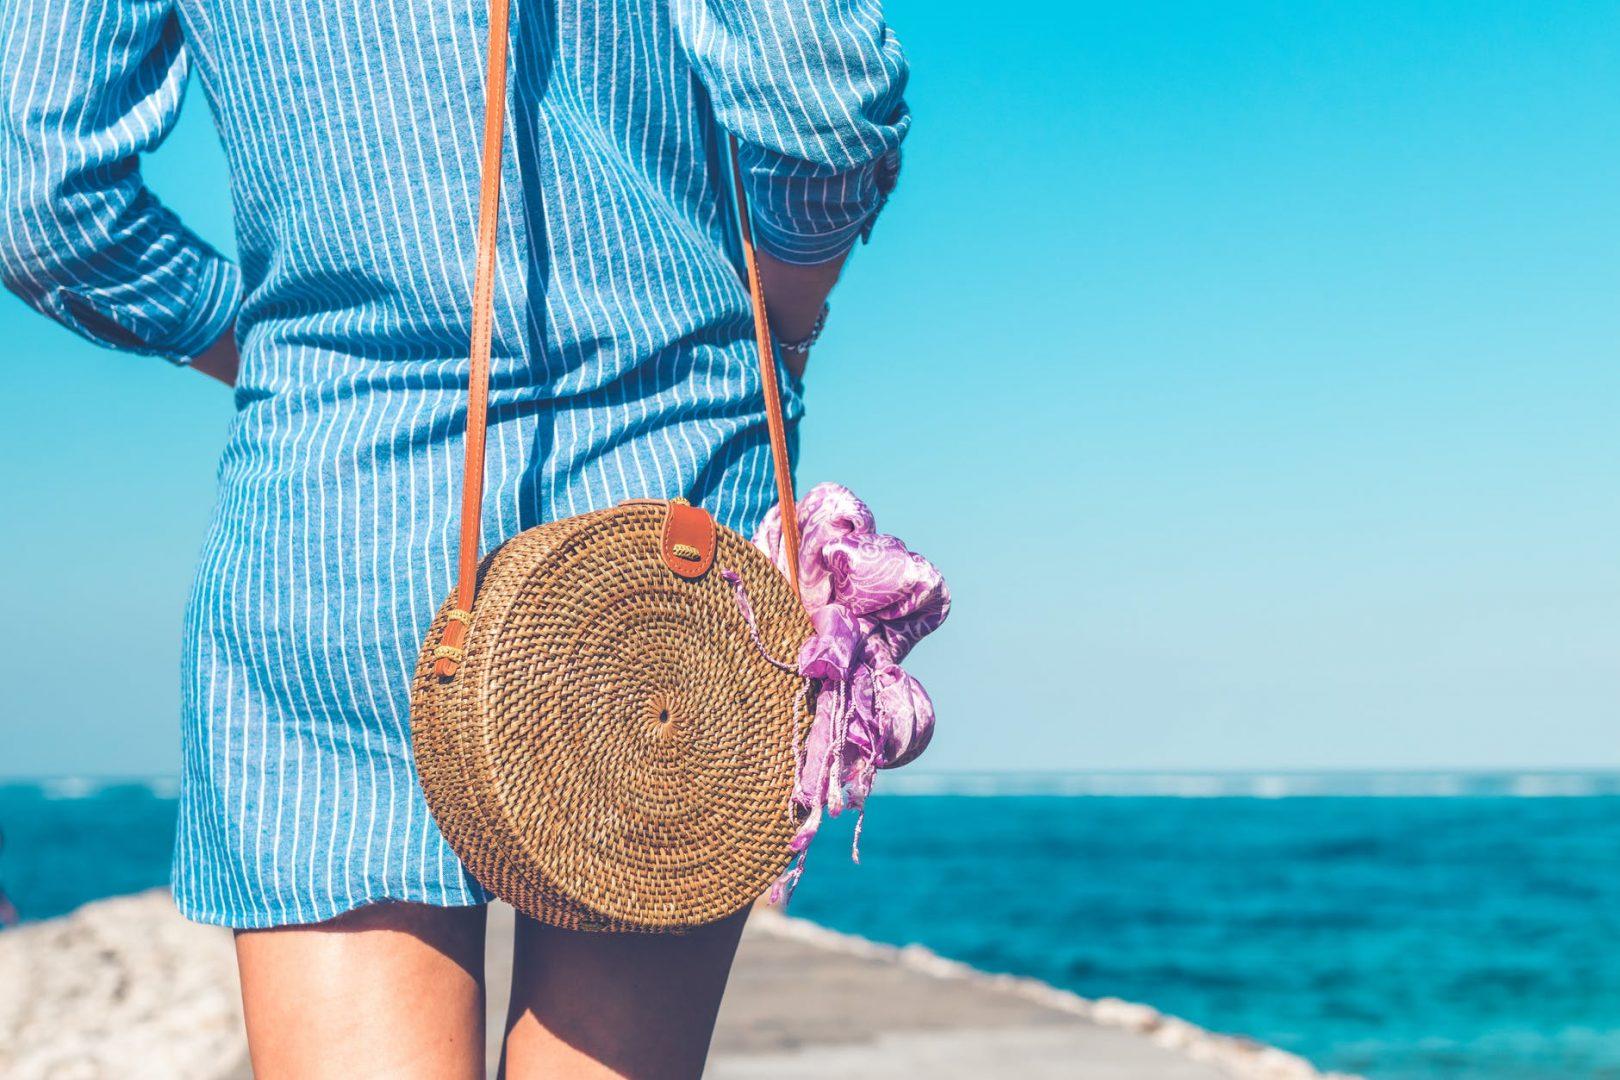 Лето 2020 на острове Гран-Канария – Новинка 2020! от 686 евро с прямым перелетом и питанием из Киева!